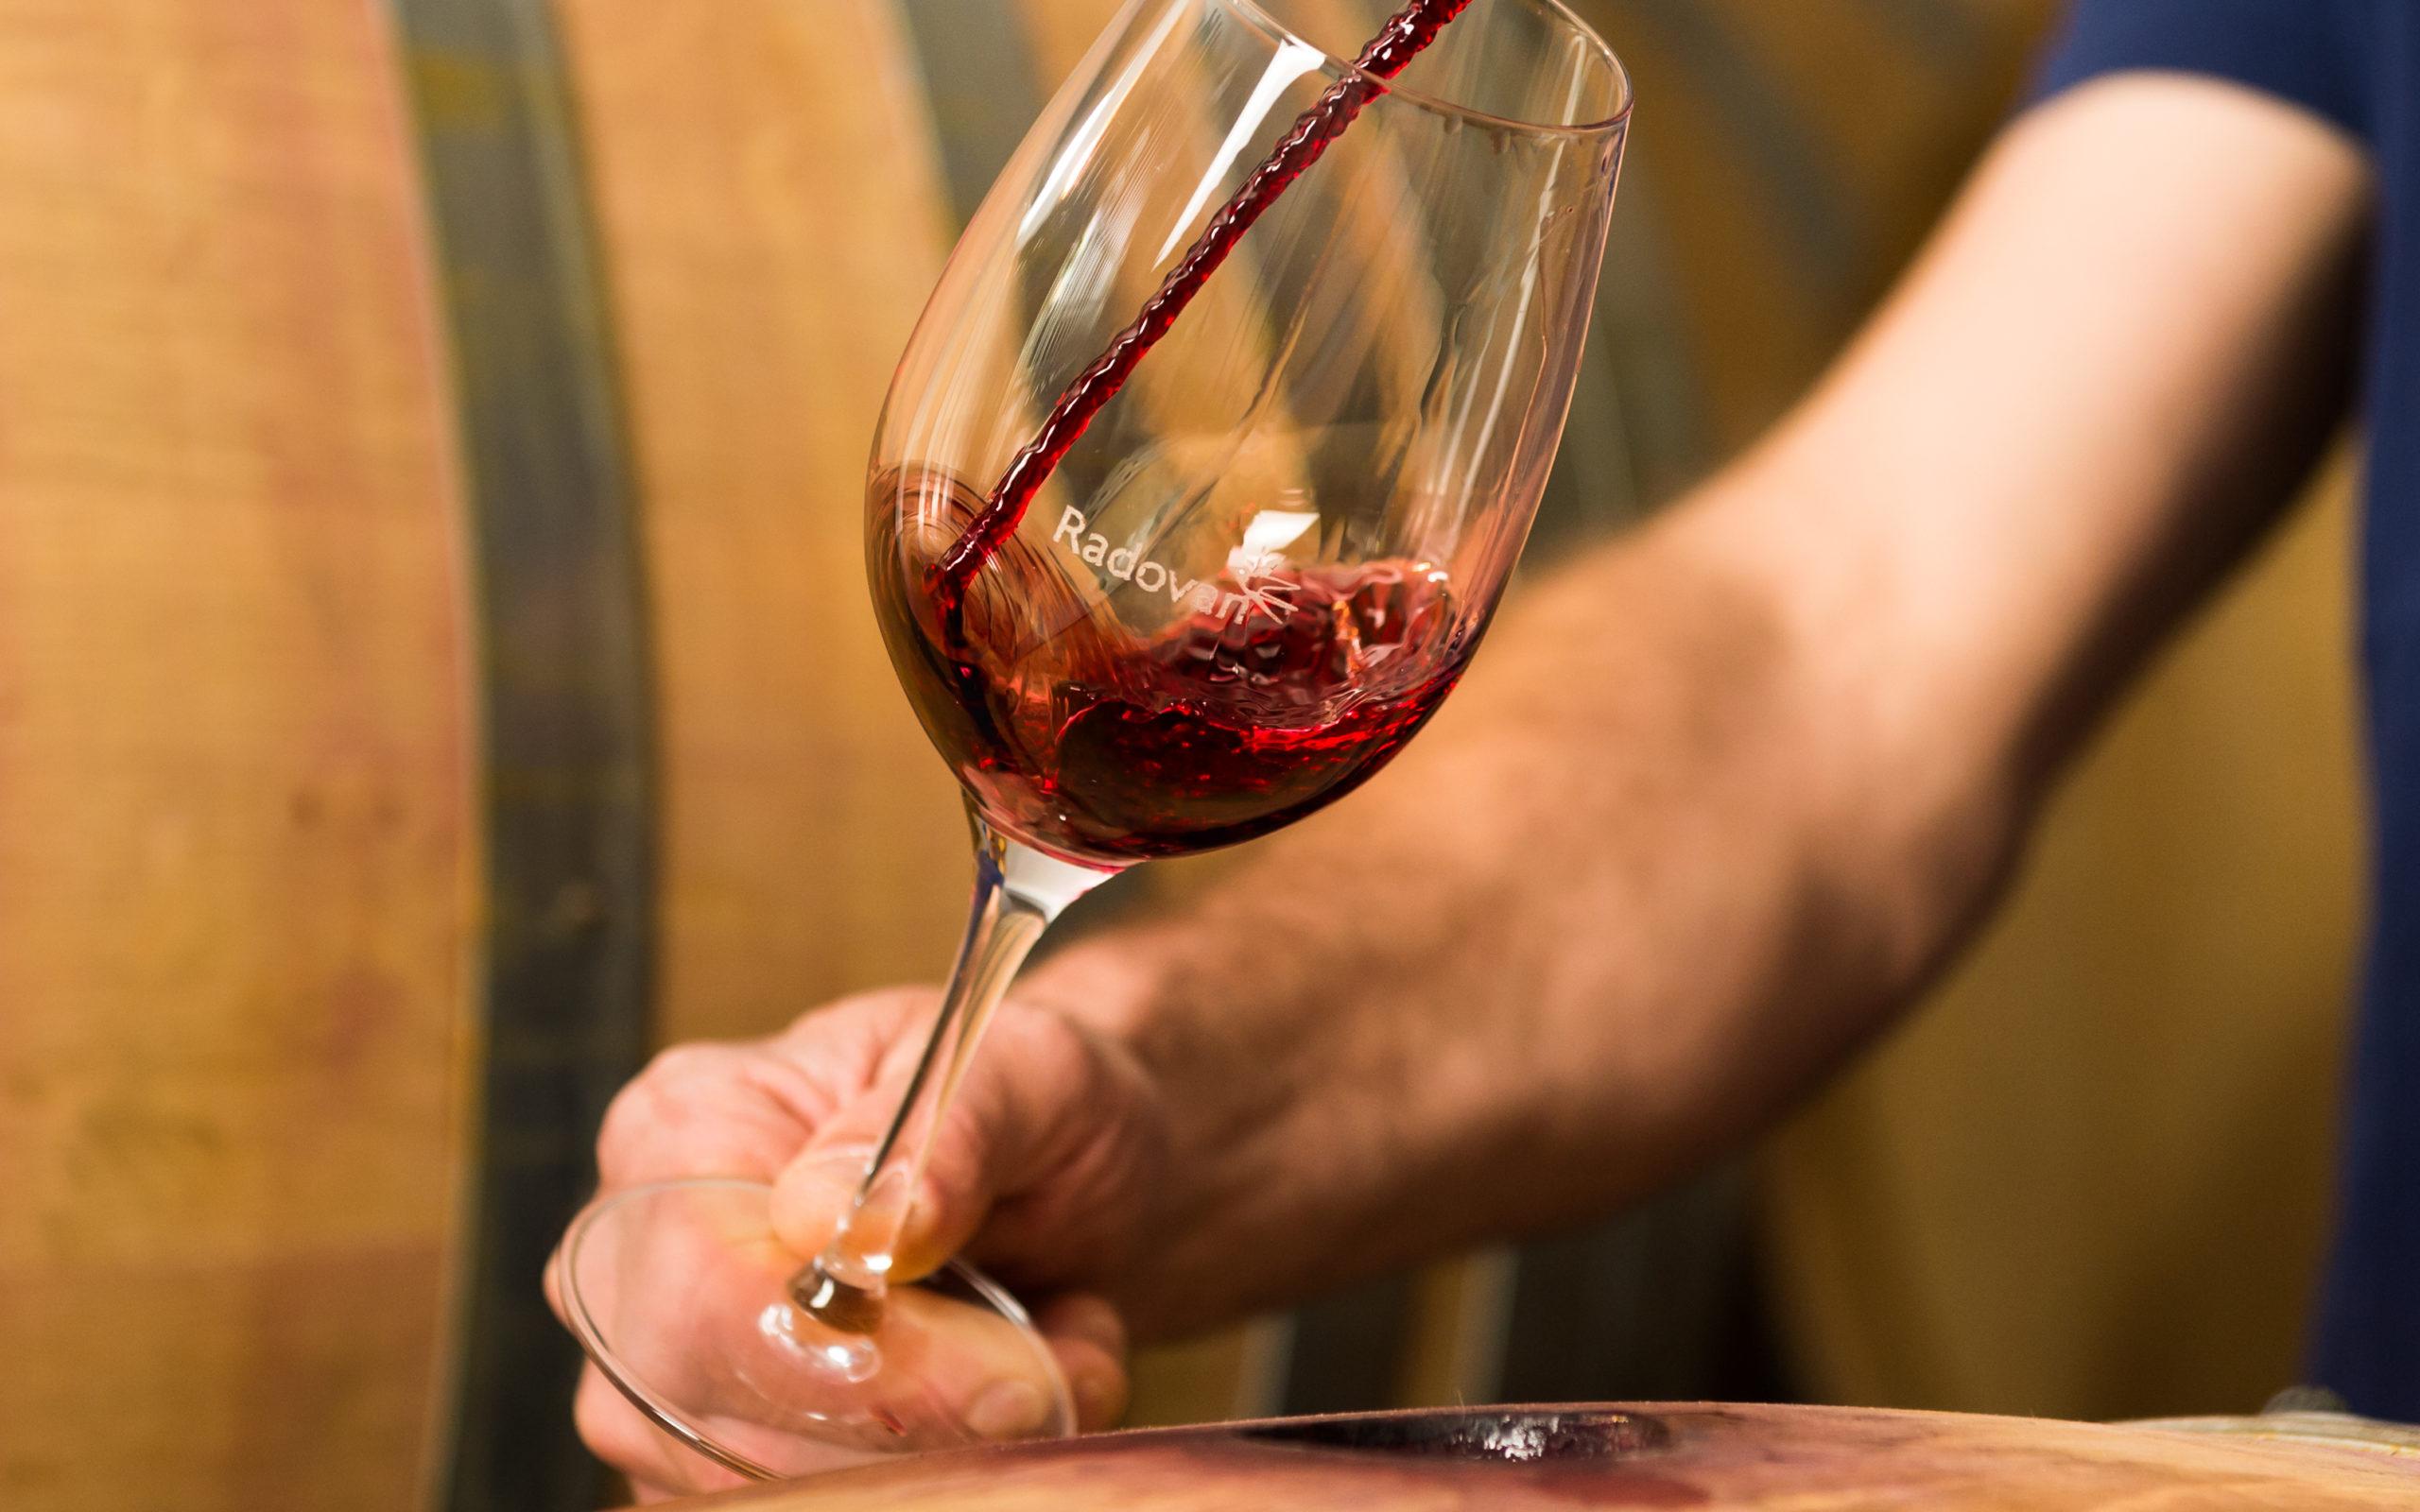 hren | plethora of creativity // Radovan winery photography